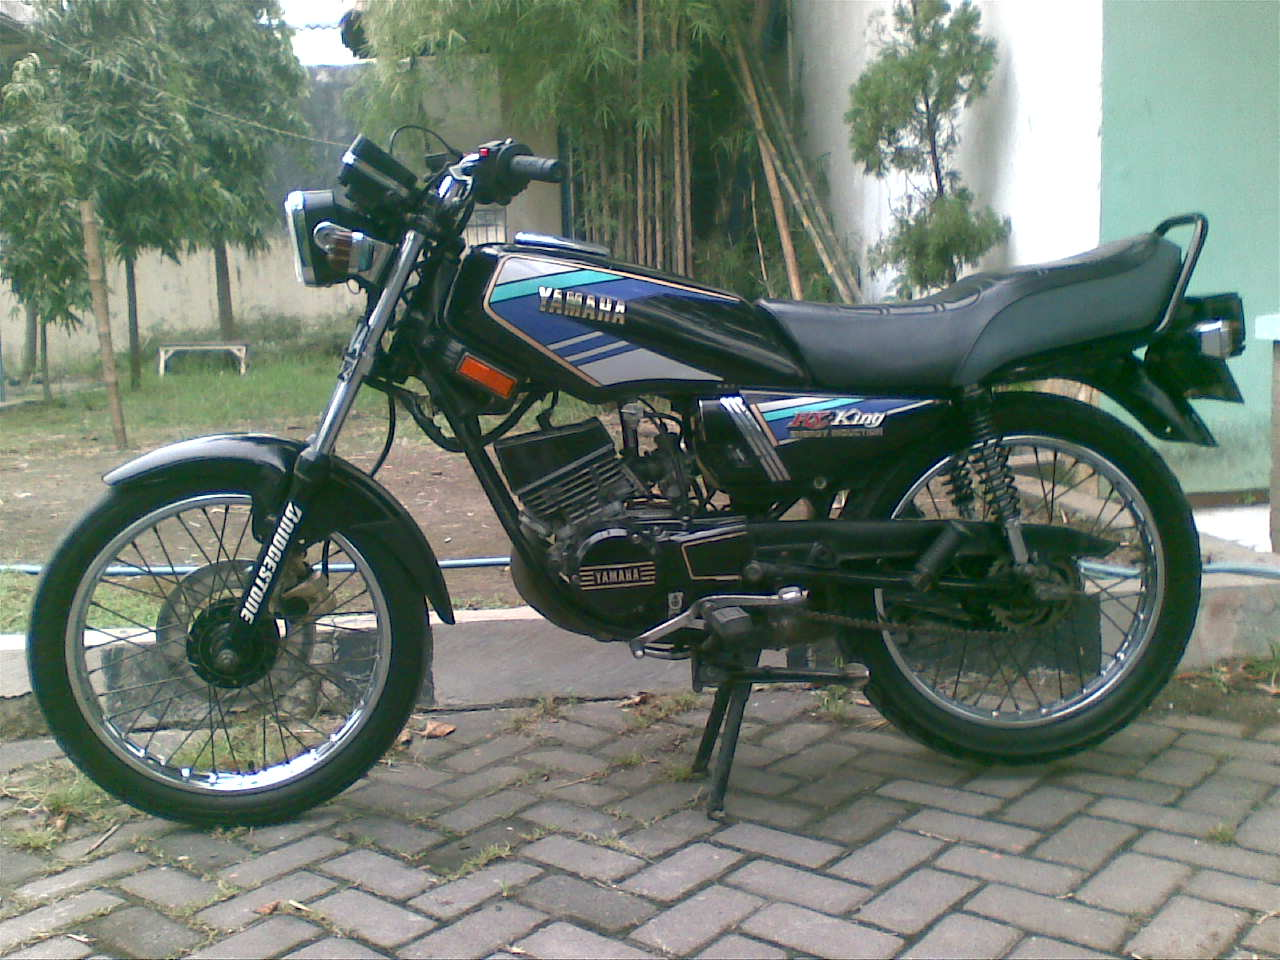 olx sepeda motor bekas di surabaya automotivegarage org